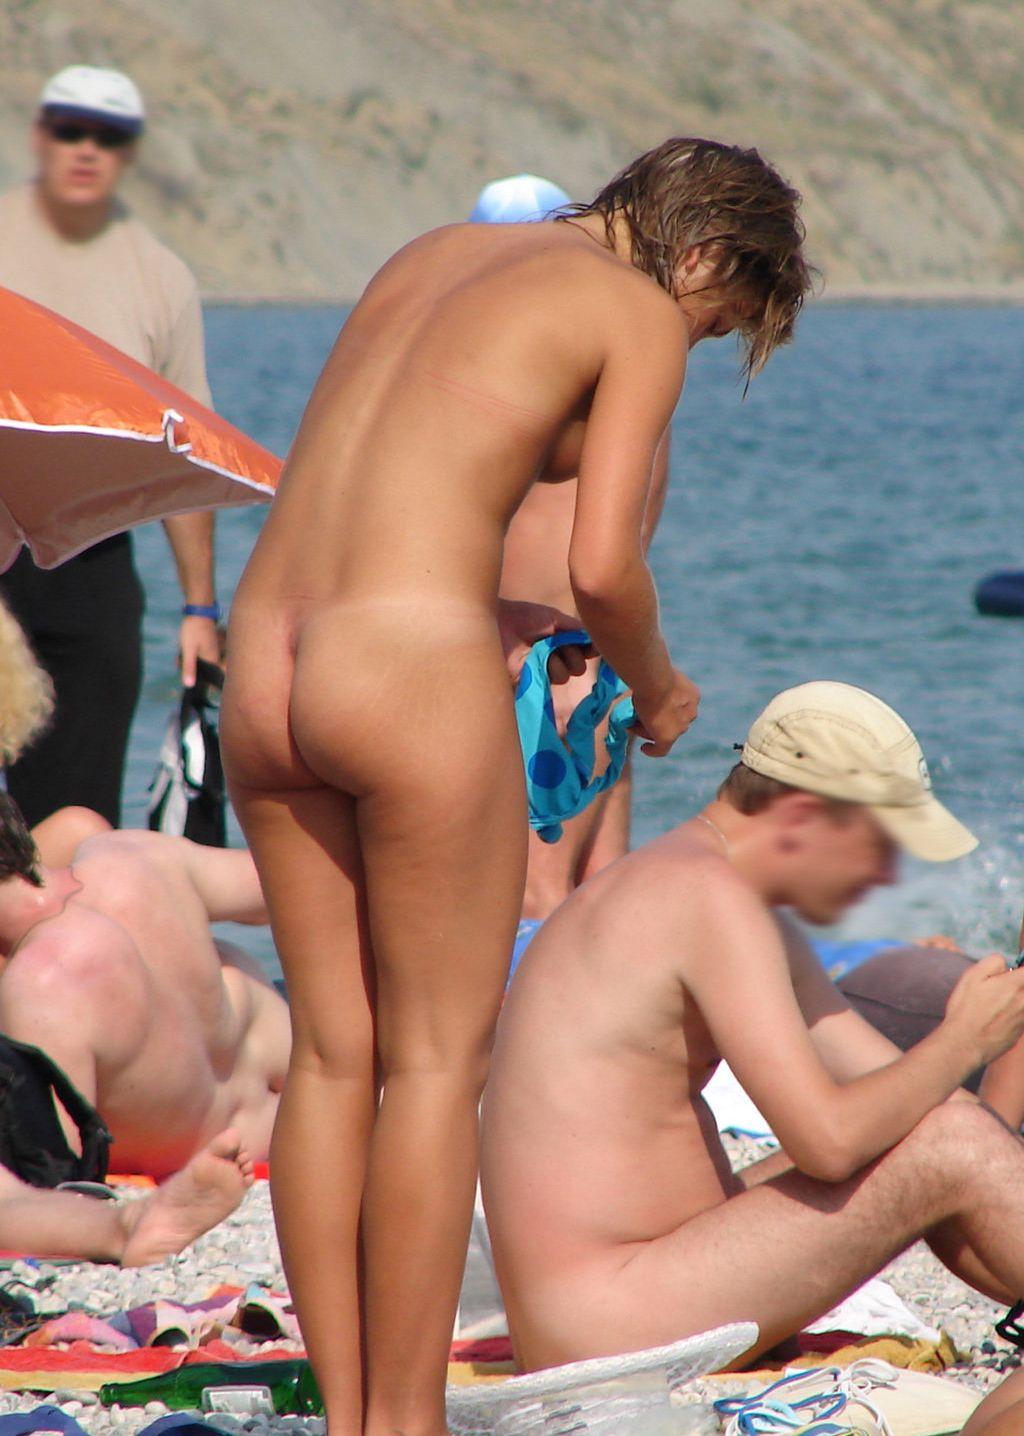 femme nue plage vivastreet orleans